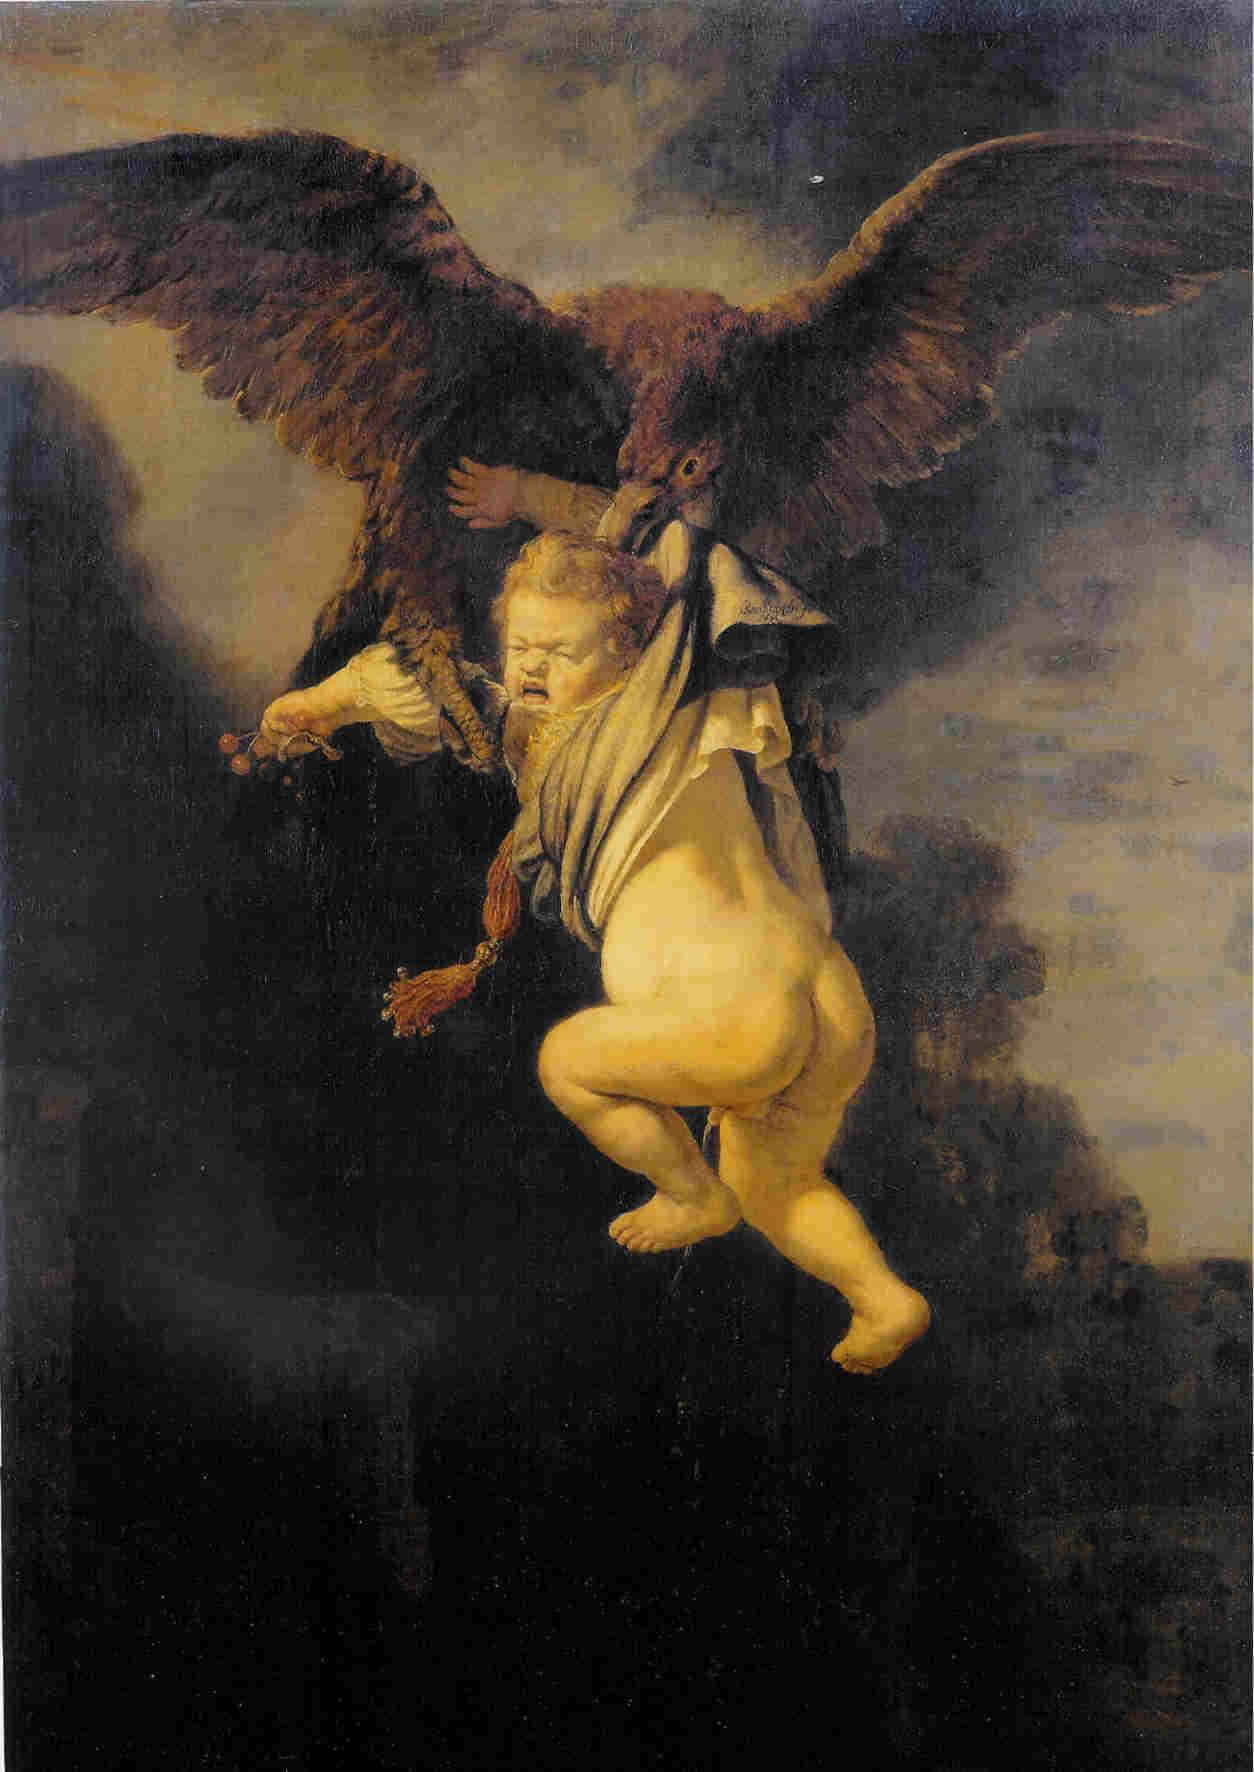 Rembrandt, The abduction of Ganymede, 1635. Dresden, Gemäldegalerie, before restoration